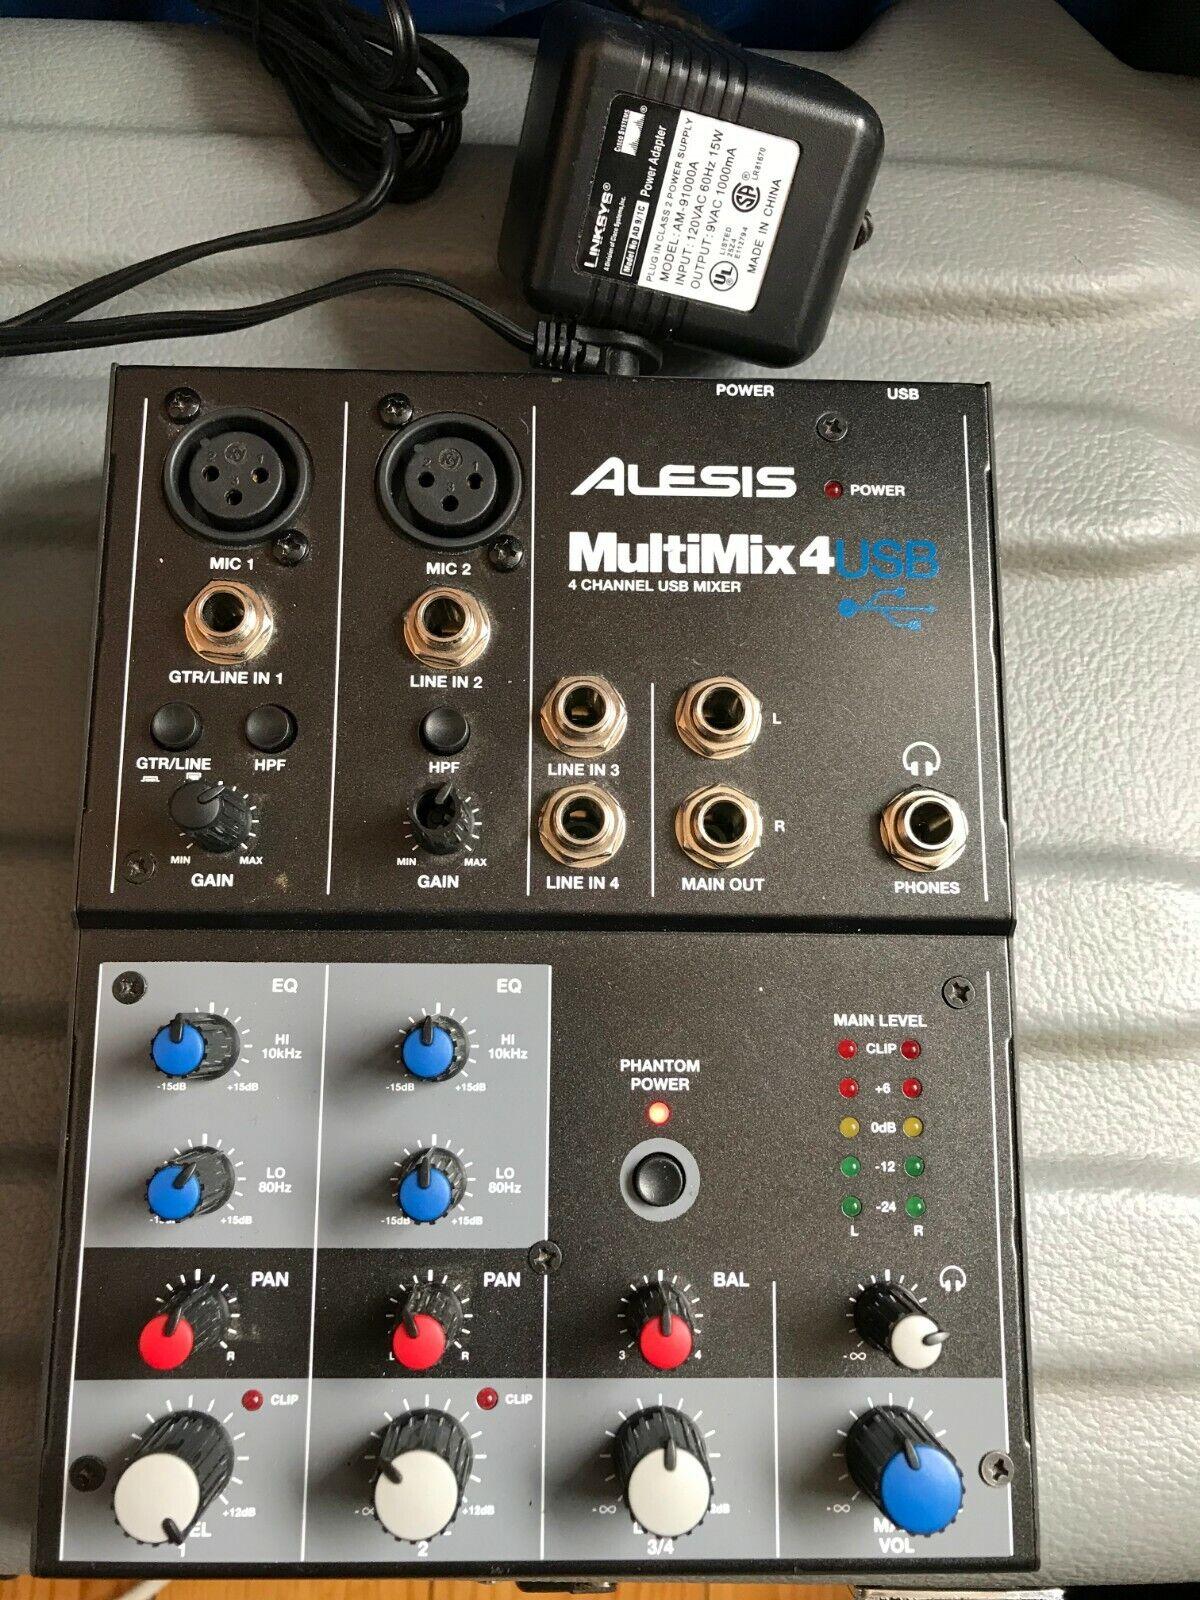 Alesis MultiMix 4 USB FX 4-Channel DJ Mixer